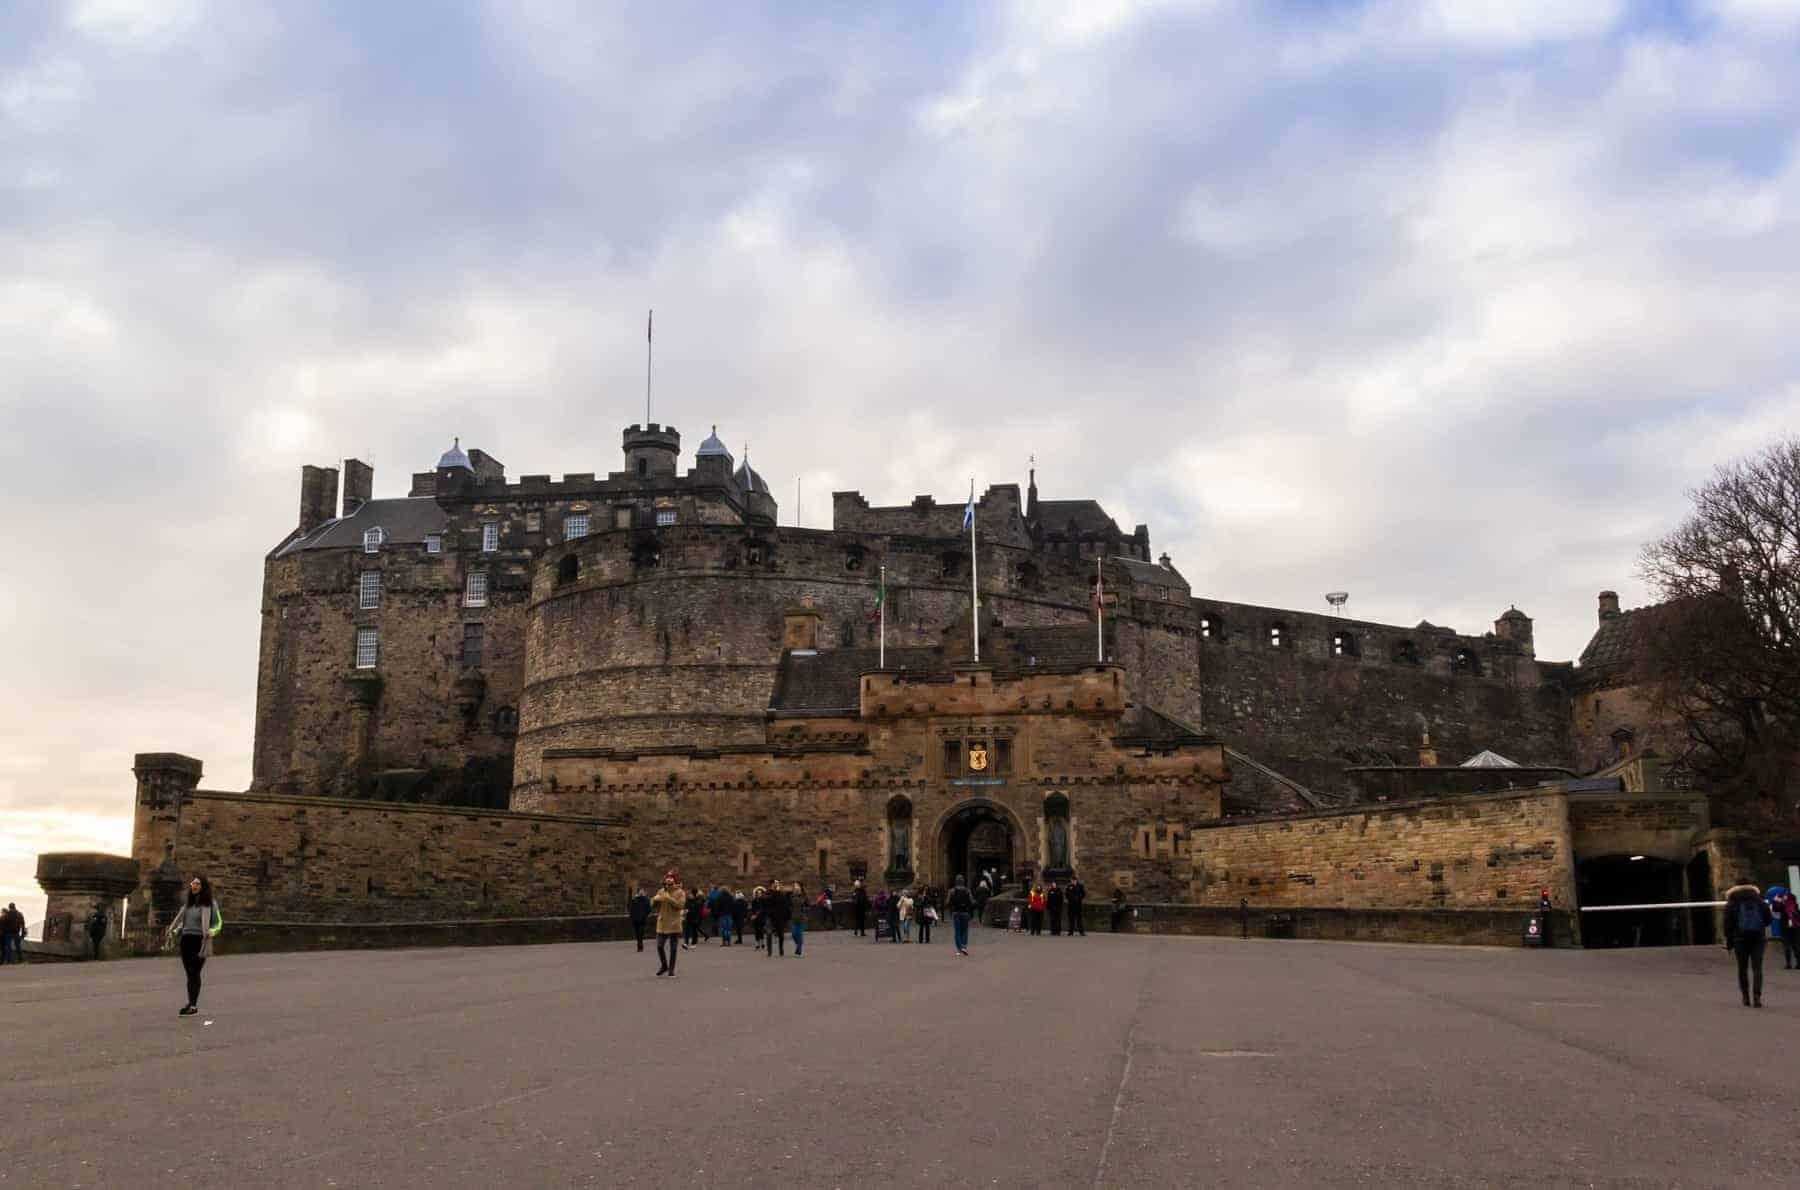 EDINBURGH, UK Tourists visiting Edinburgh Castle